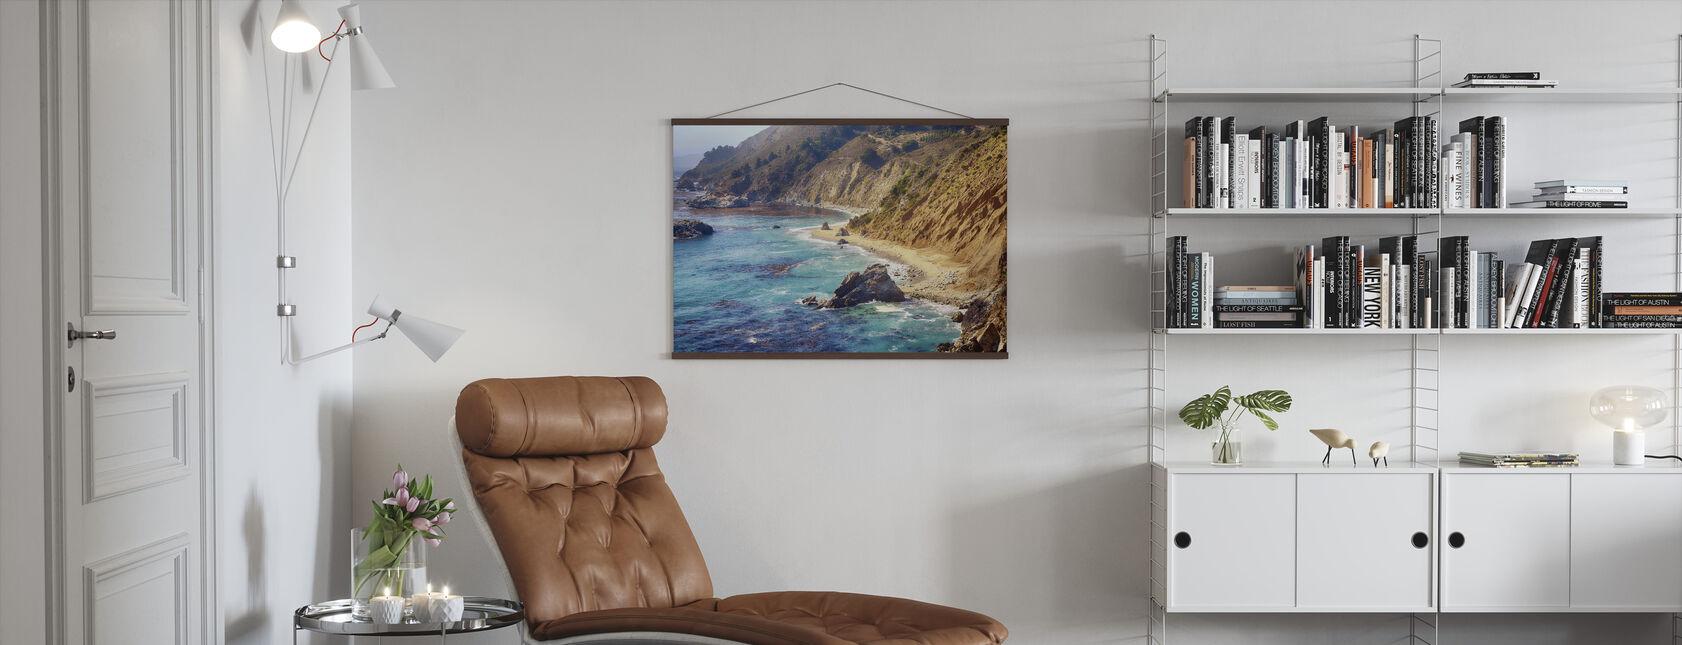 Steep Cliffs - Poster - Living Room